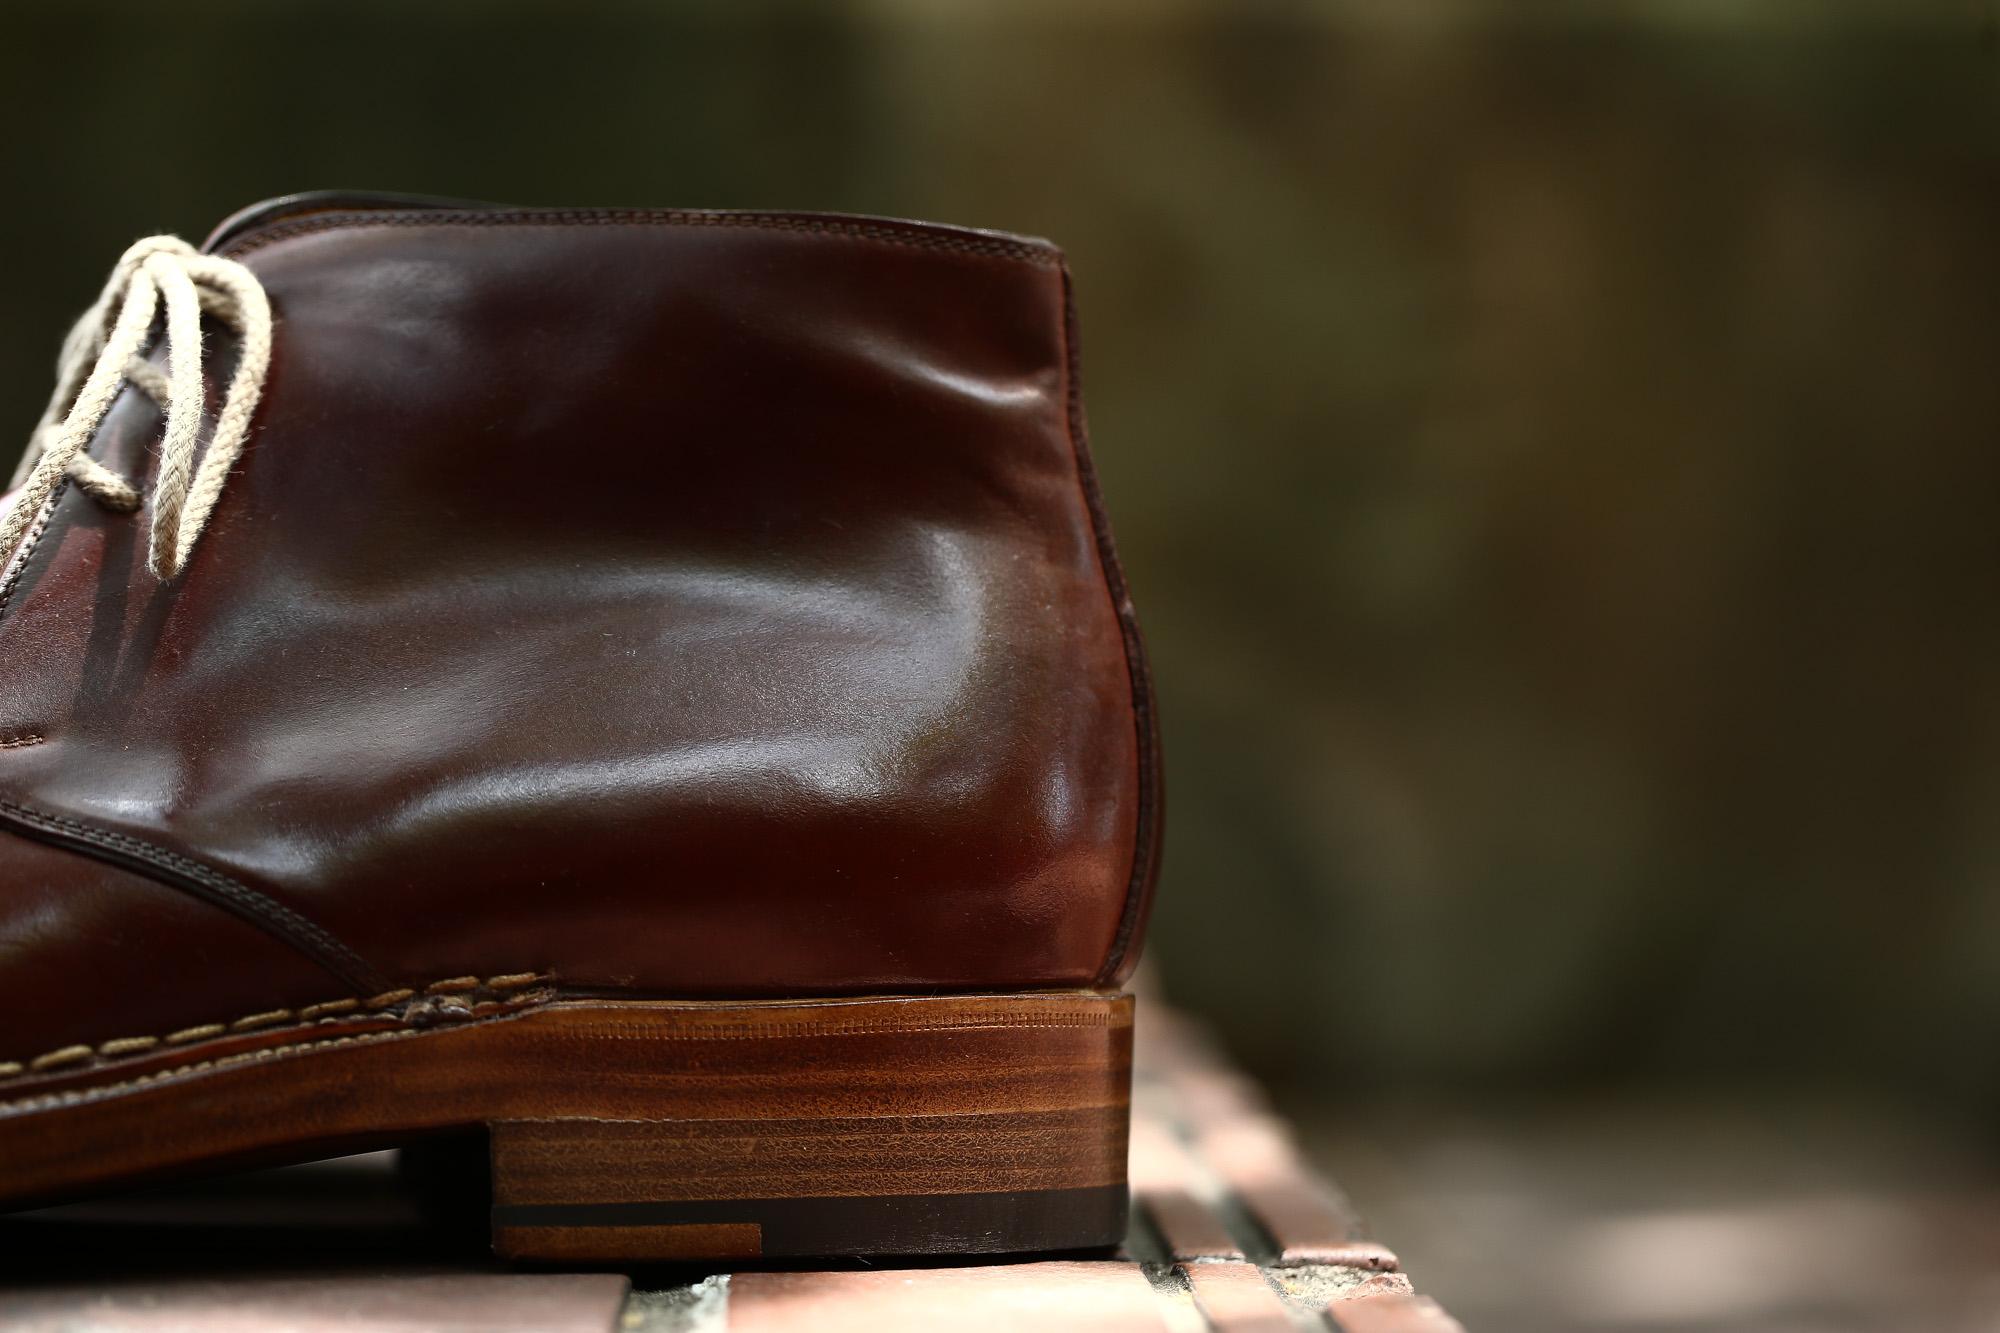 ENZO BONAFE (エンツォボナフェ) ART.3722 Chukka boots チャッカブーツ Horween Shell Cordovan Leather ホーウィン社 シェルコードバンレザー 【ノルベジェーゼ製法】 チャッカブーツ コードバンブーツ 【No.4】  made in italy (イタリア製) 2017 秋冬新作 愛知 名古屋 ZODIAC ゾディアック エンツォボナフェ コードバン チャッカ enzobonafe コードヴァン